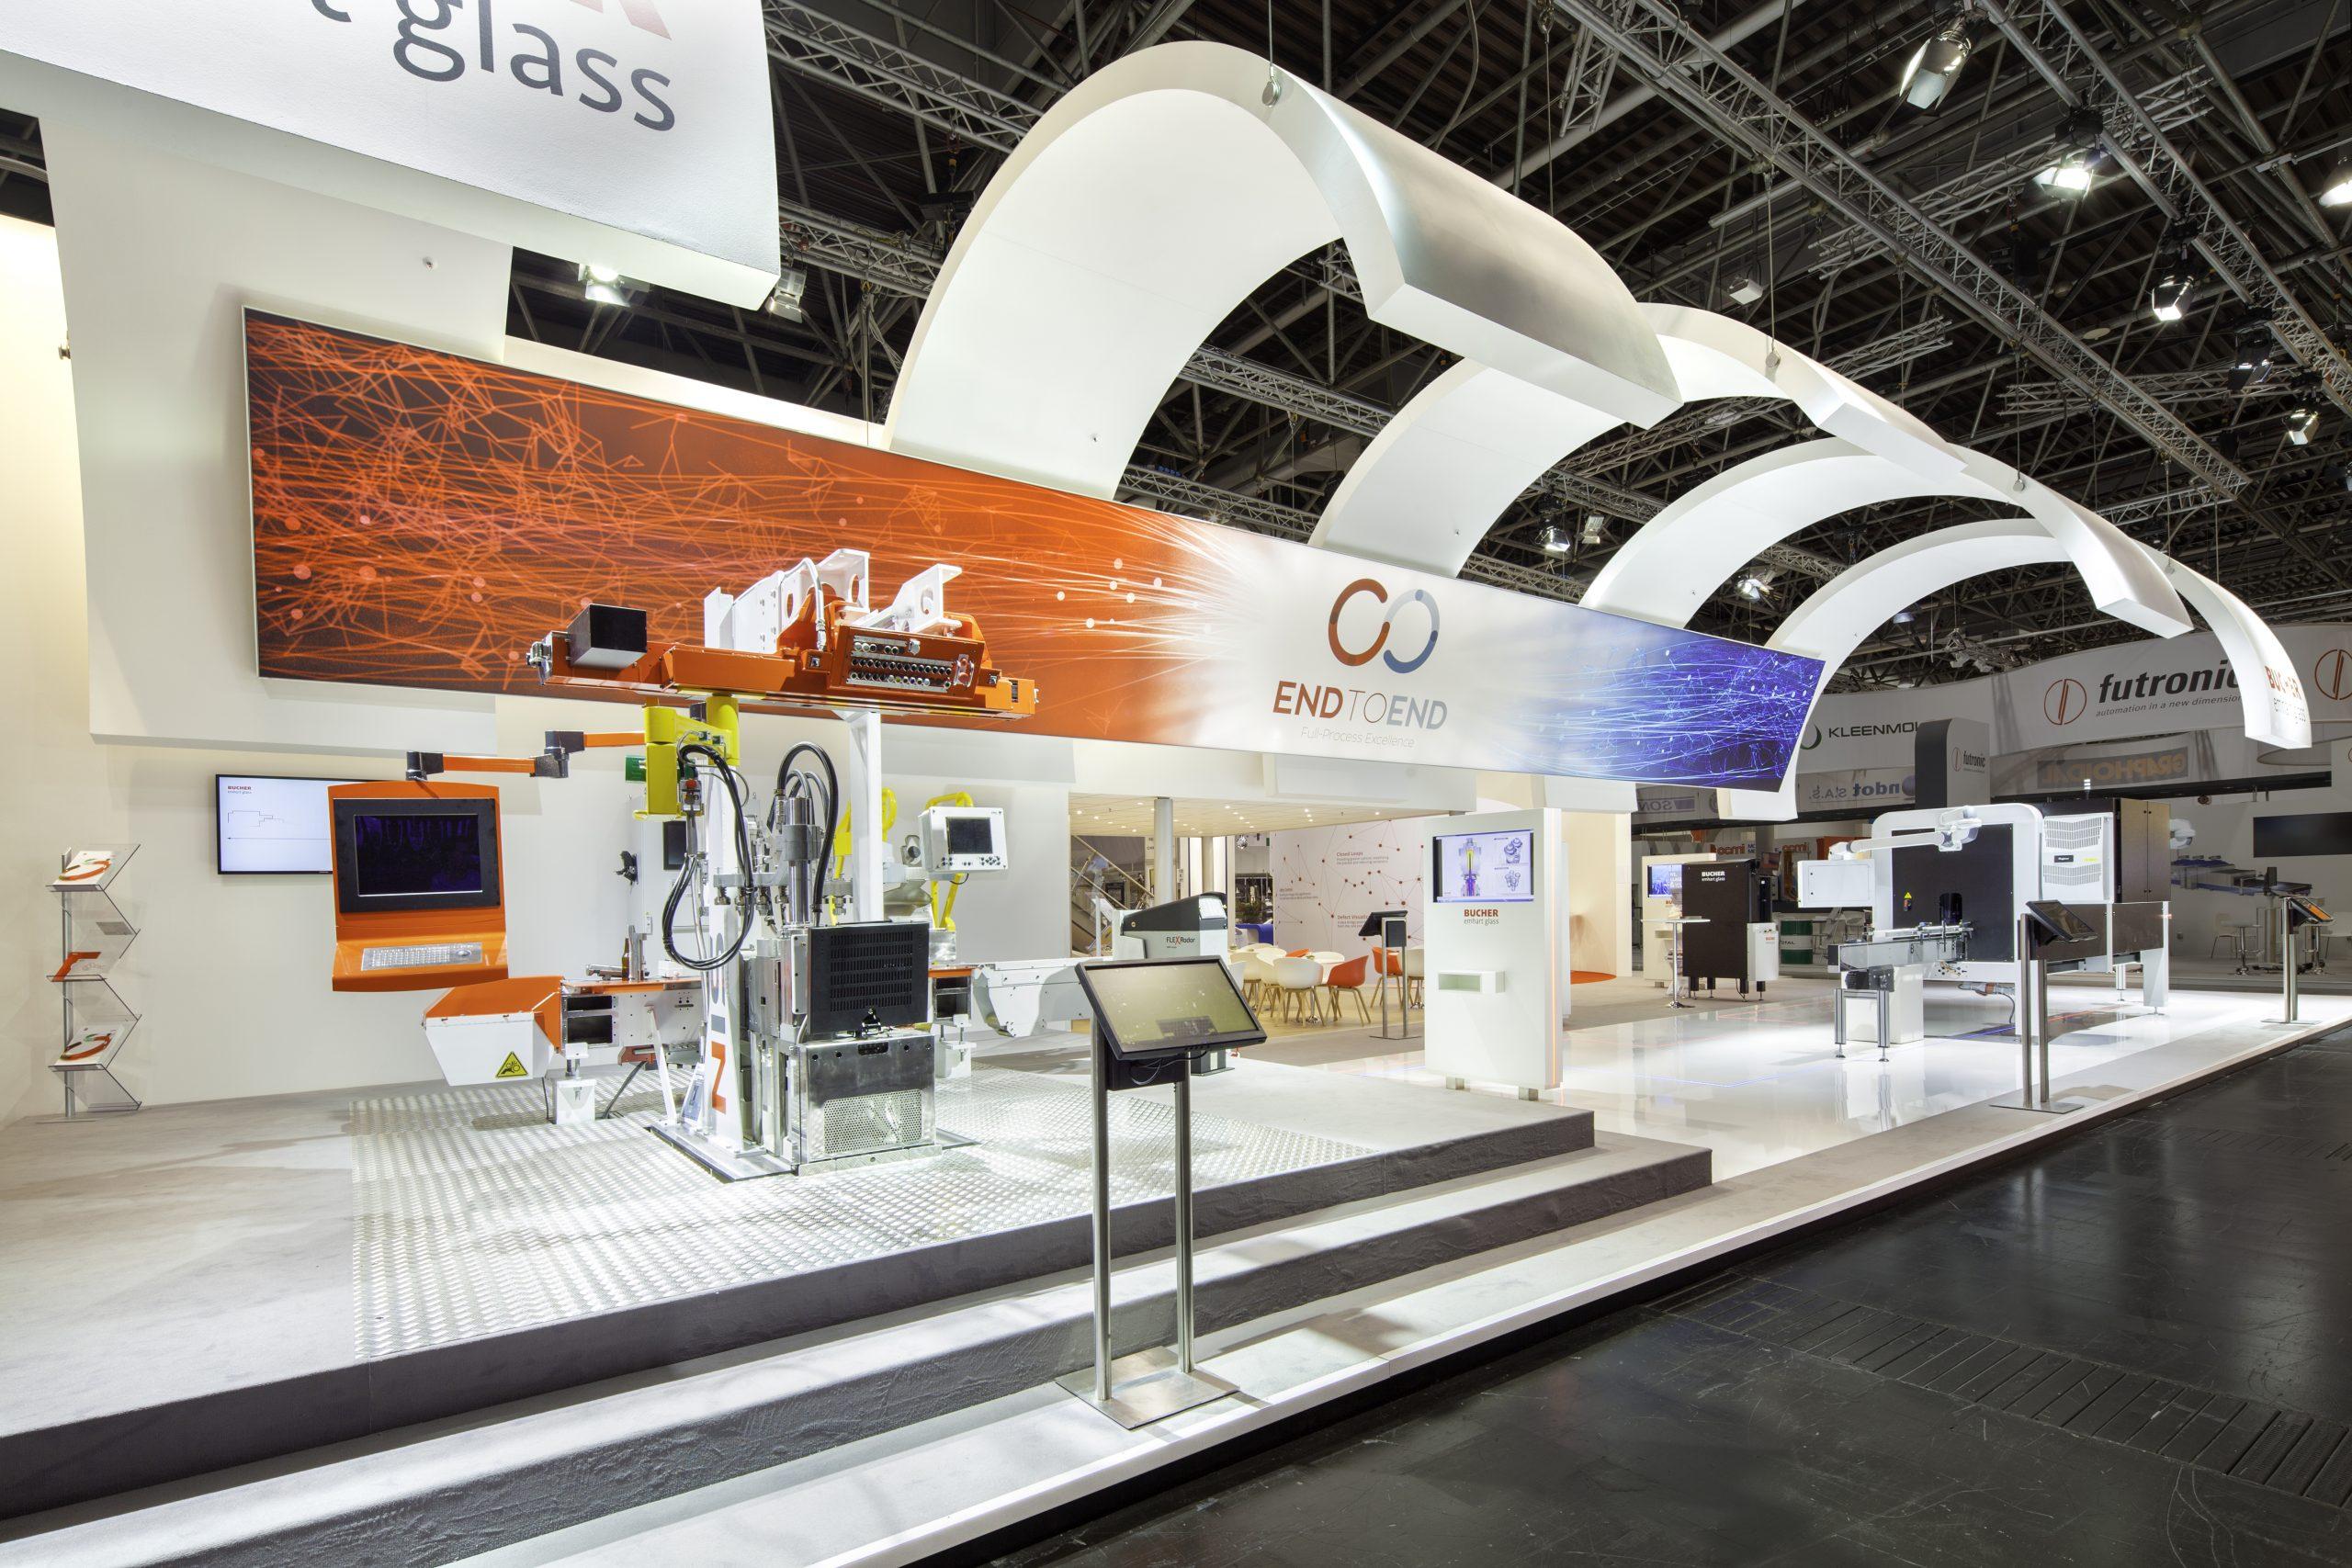 CAS Exhibition Partners - Bucher - Glasstec 2016 Duesseldorf - Standbouwfotografie #1612